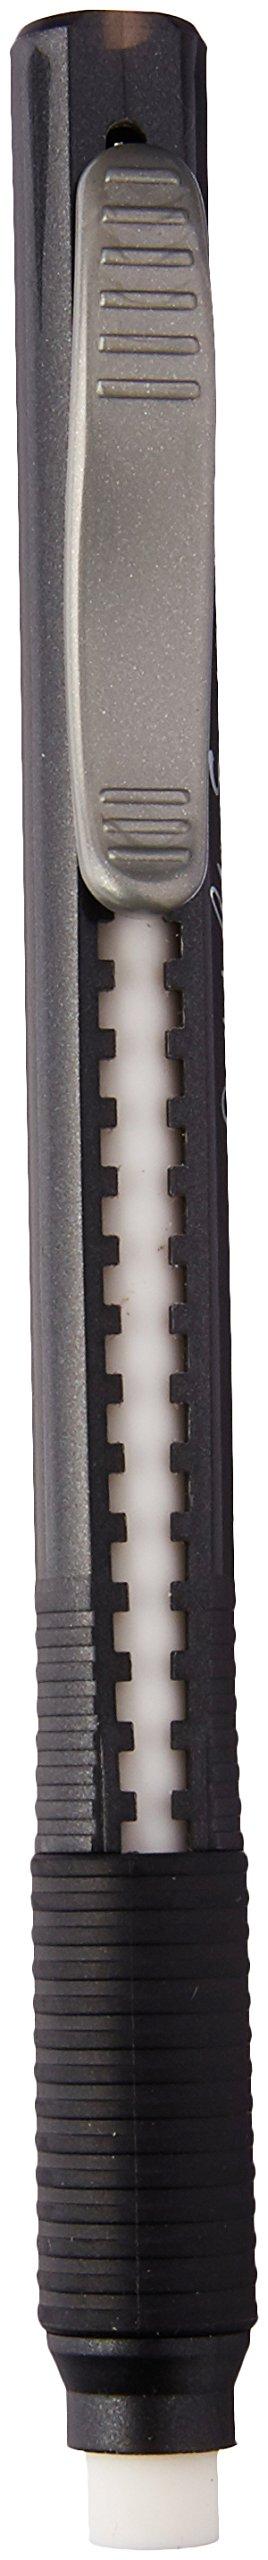 Pentel Clic Eraser Retractable Display Assortment (ZE22-5) by Pentel (Image #2)